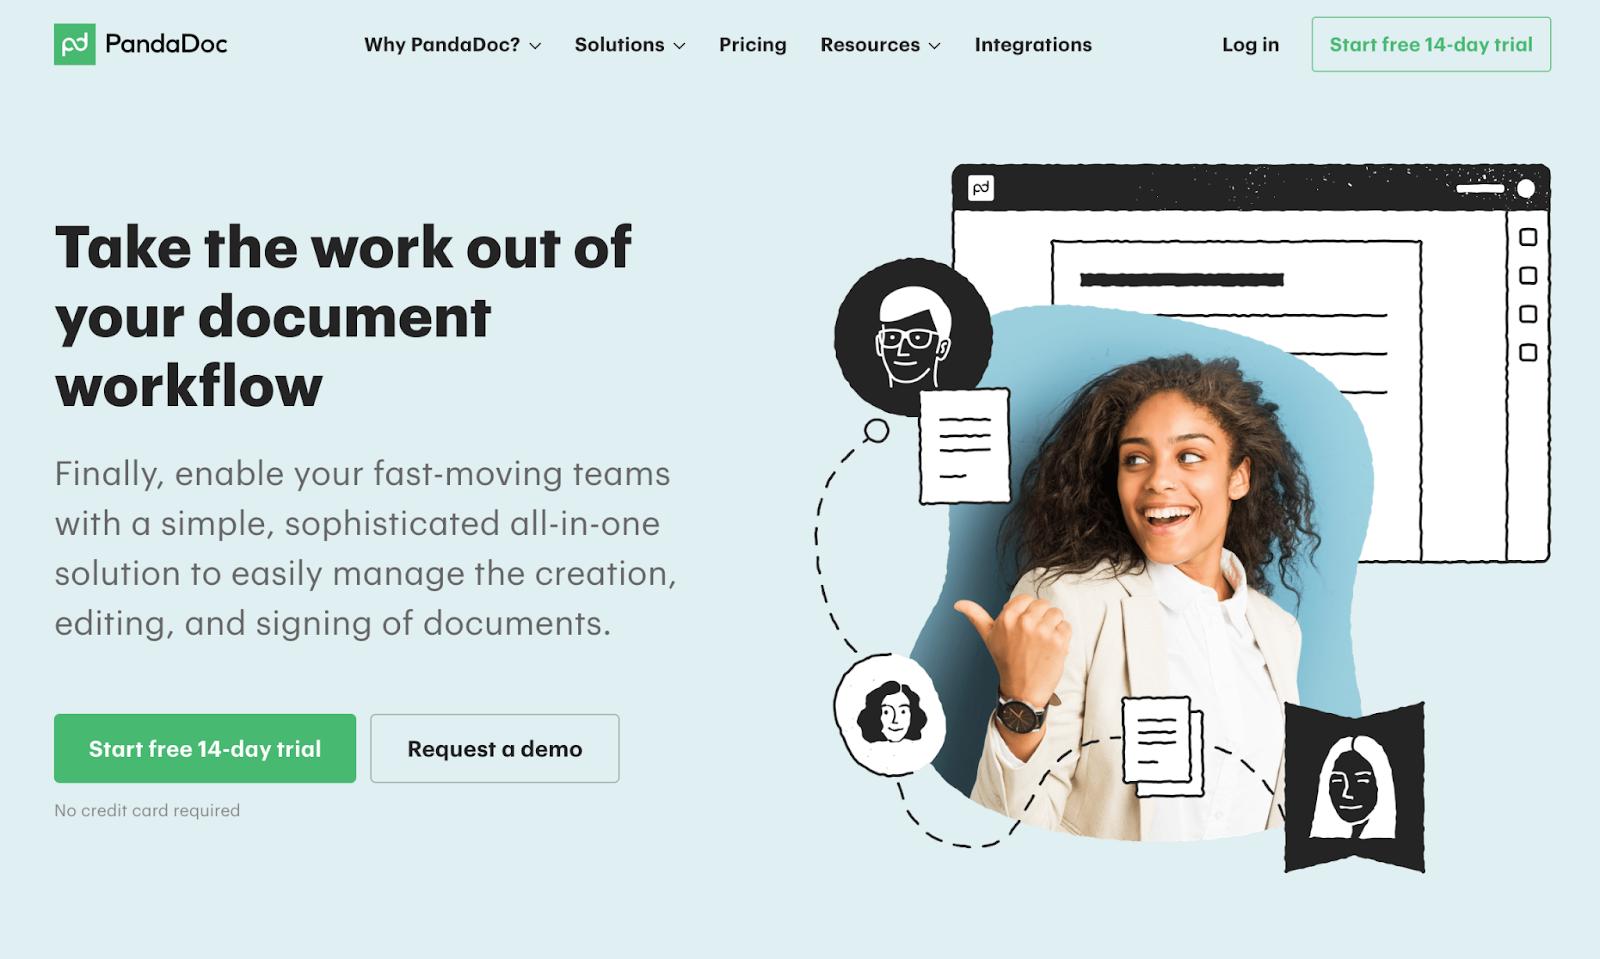 pandadoc proposal software for freelancers